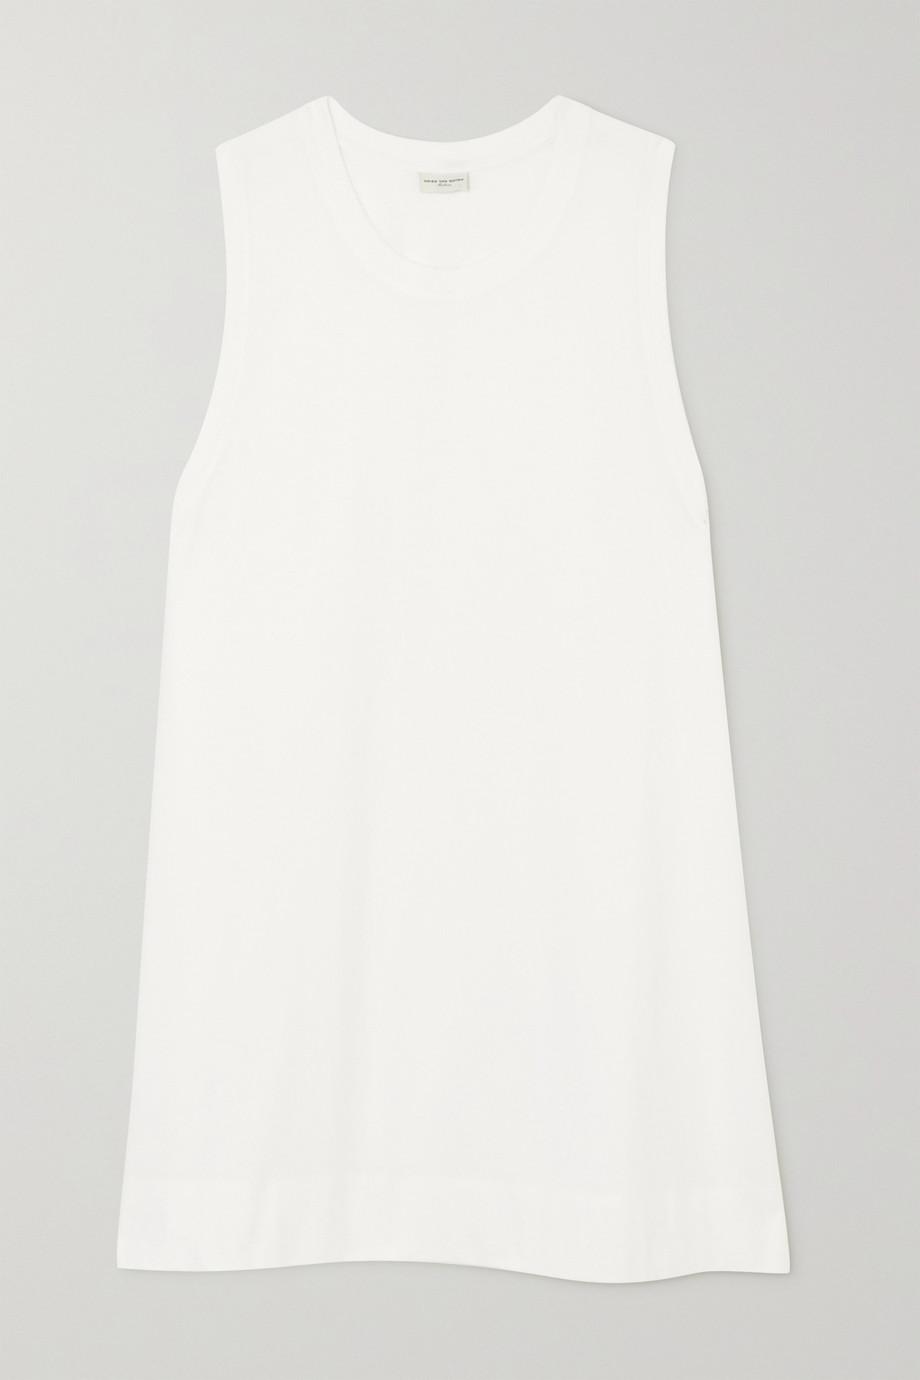 Dries Van Noten Cotton-jersey mini dress